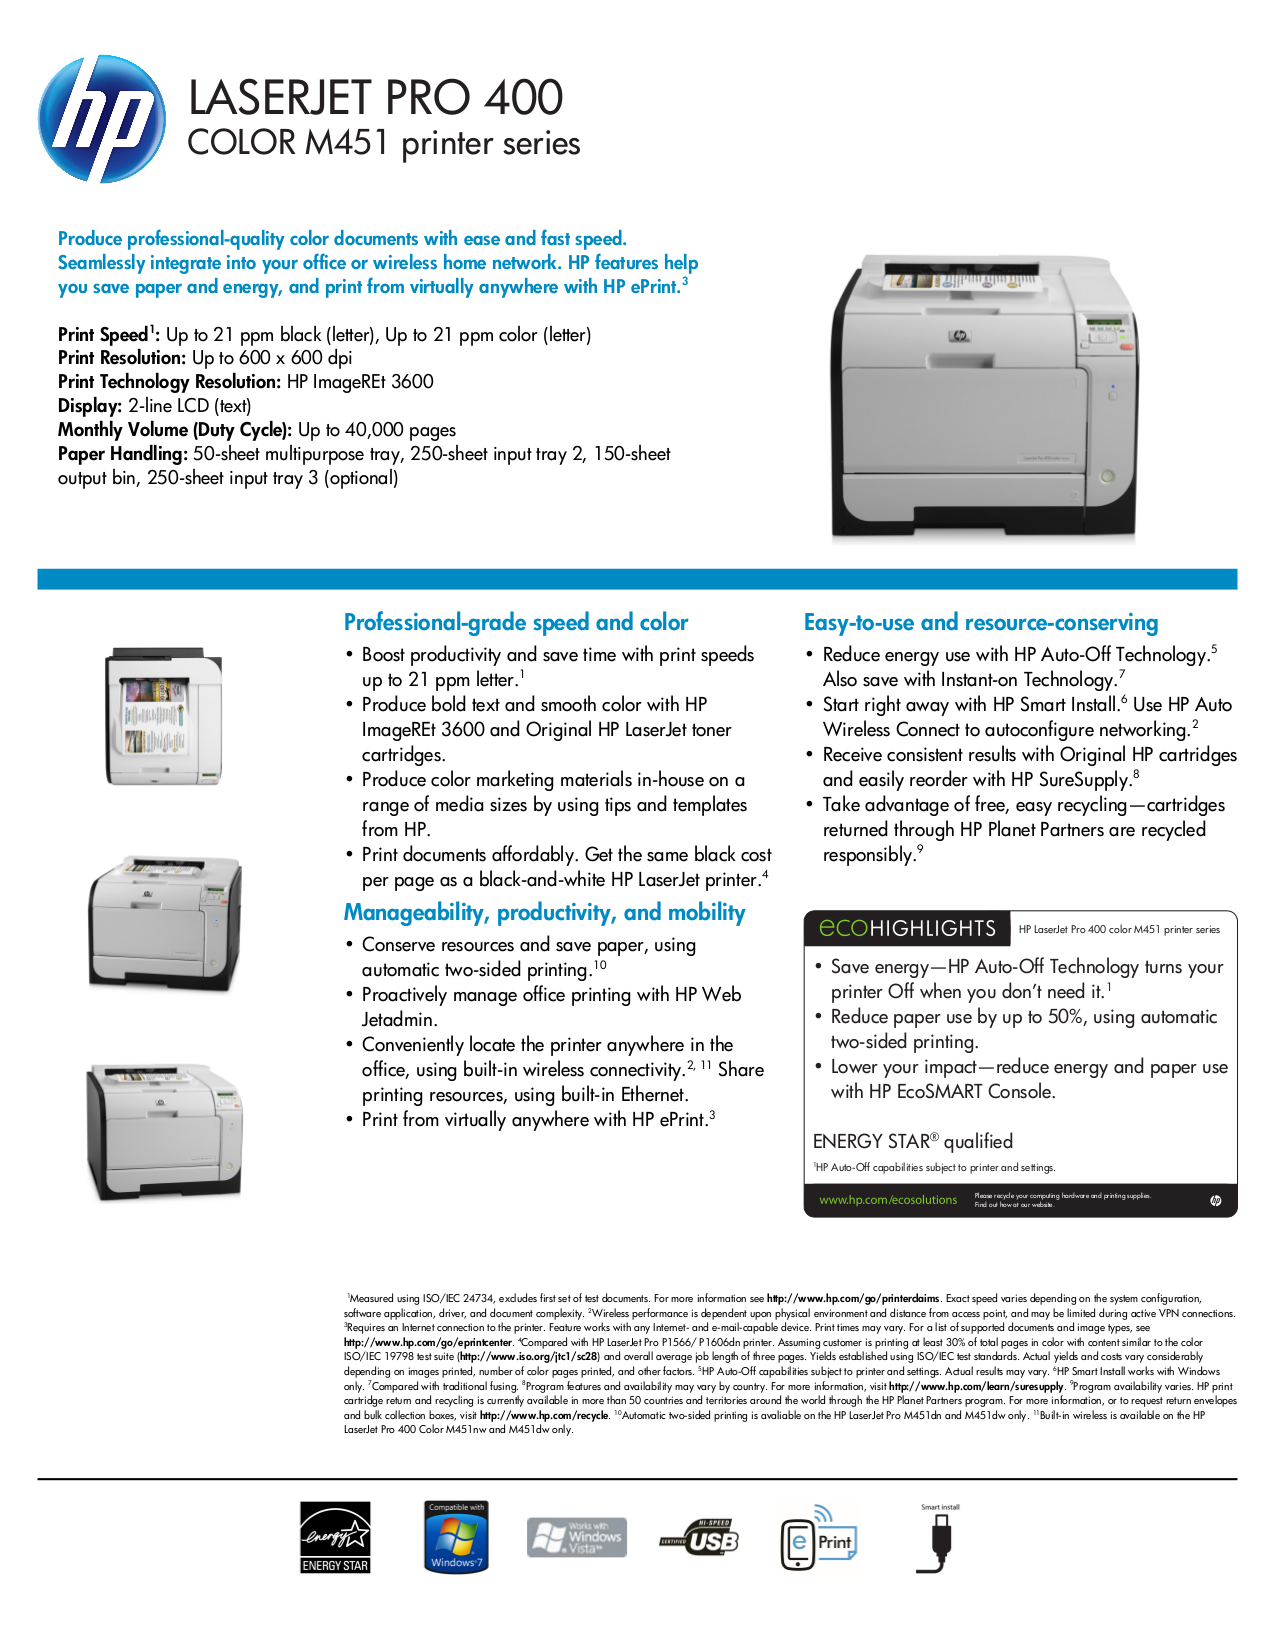 download free pdf for hp laserjet color laserjet pro p1566 printer rh umlib com 1800 HP Printer HP 4700 Printer